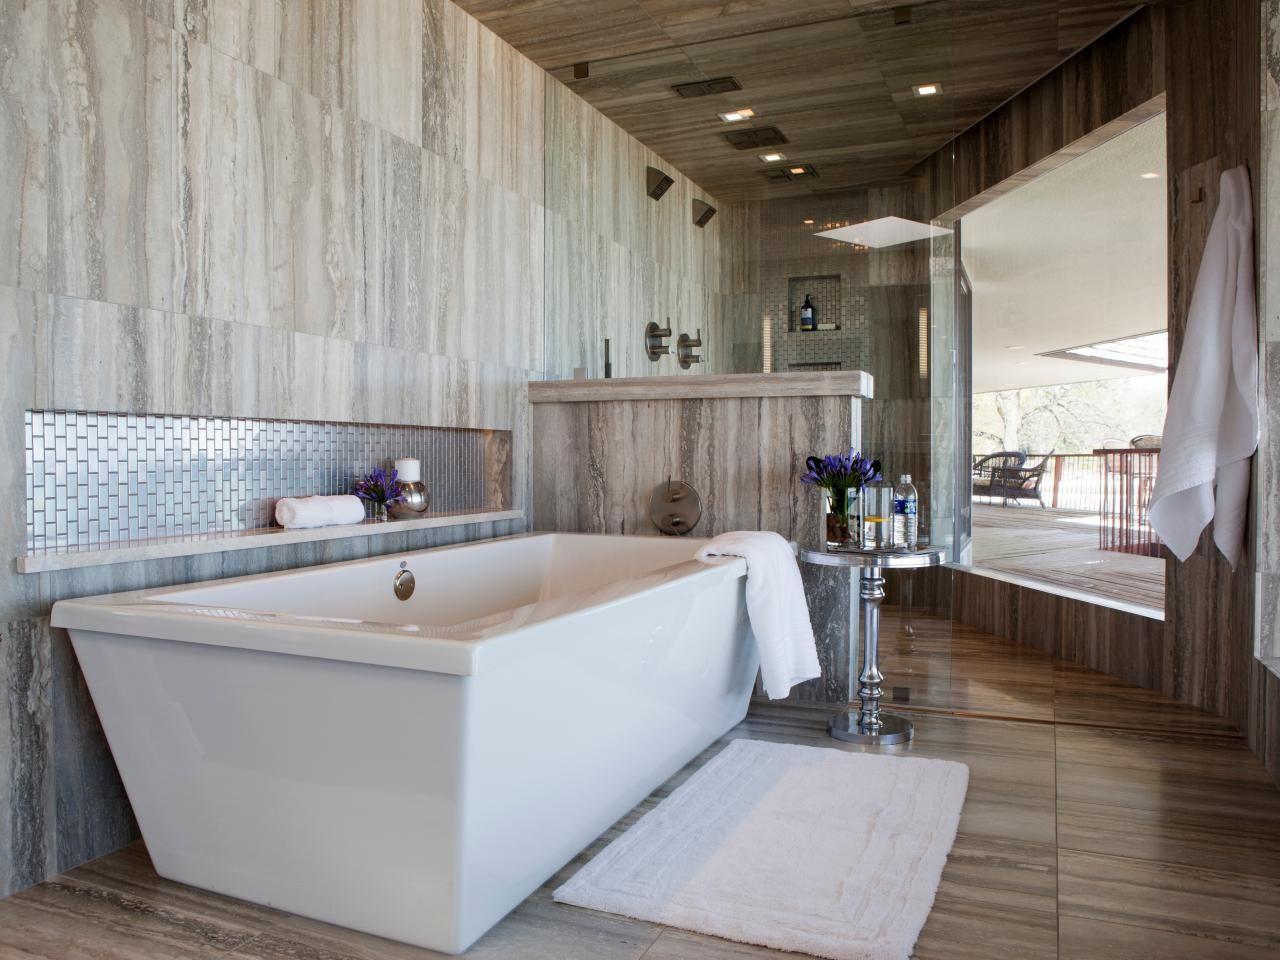 Bathtub Styles and Options | Bathtub, Hgtv and Tubs